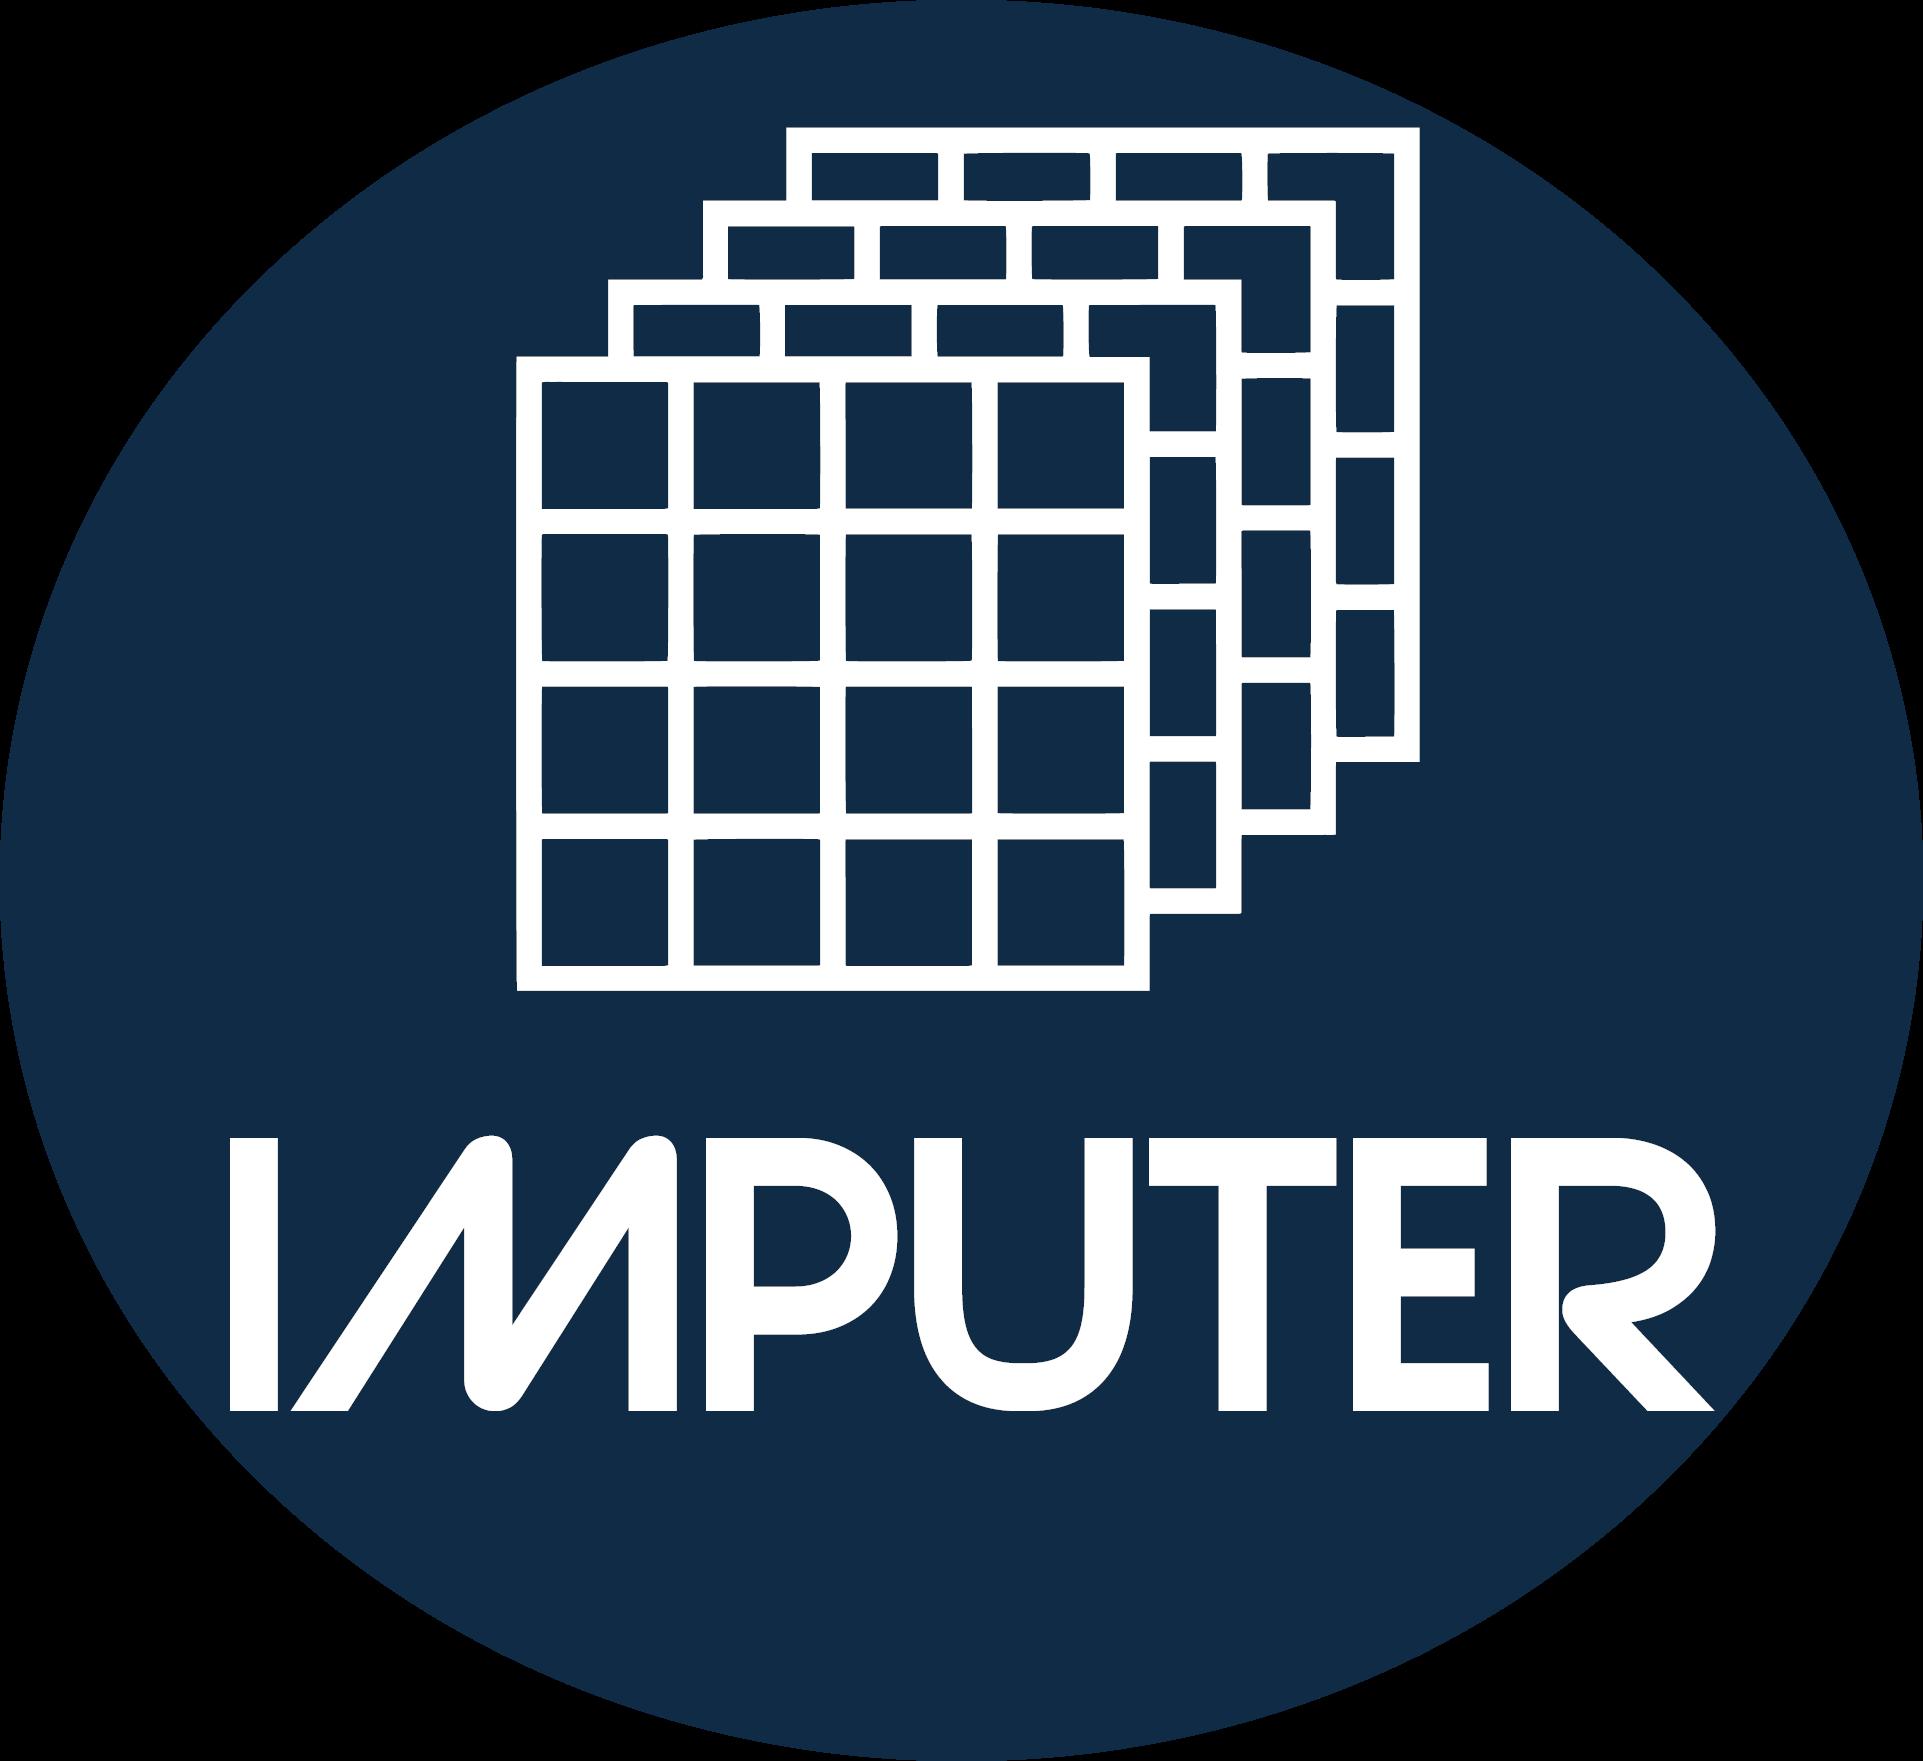 Imputer